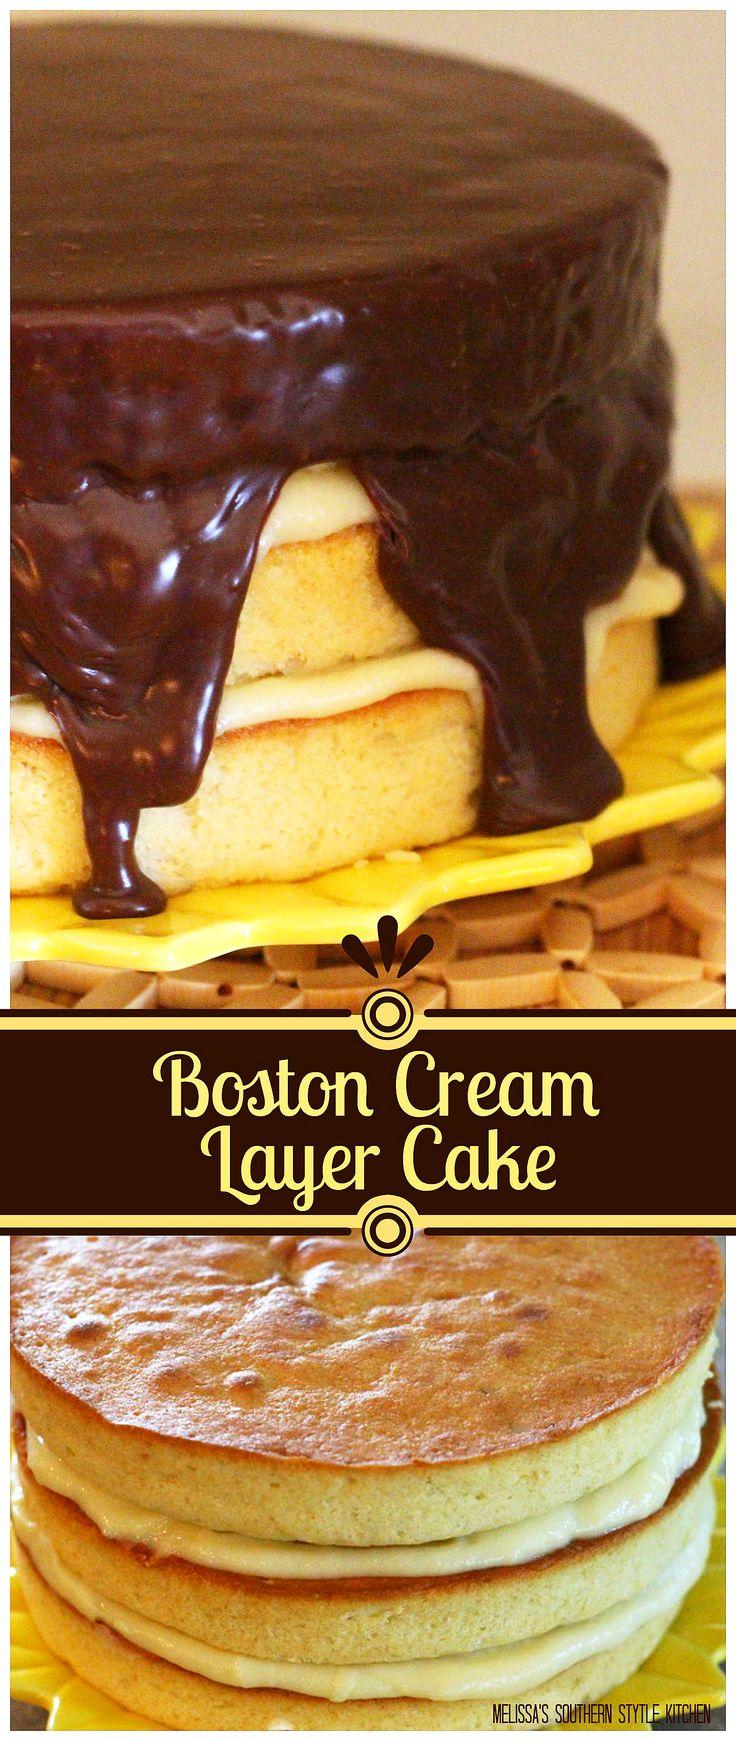 Boston Cream Layer Cake